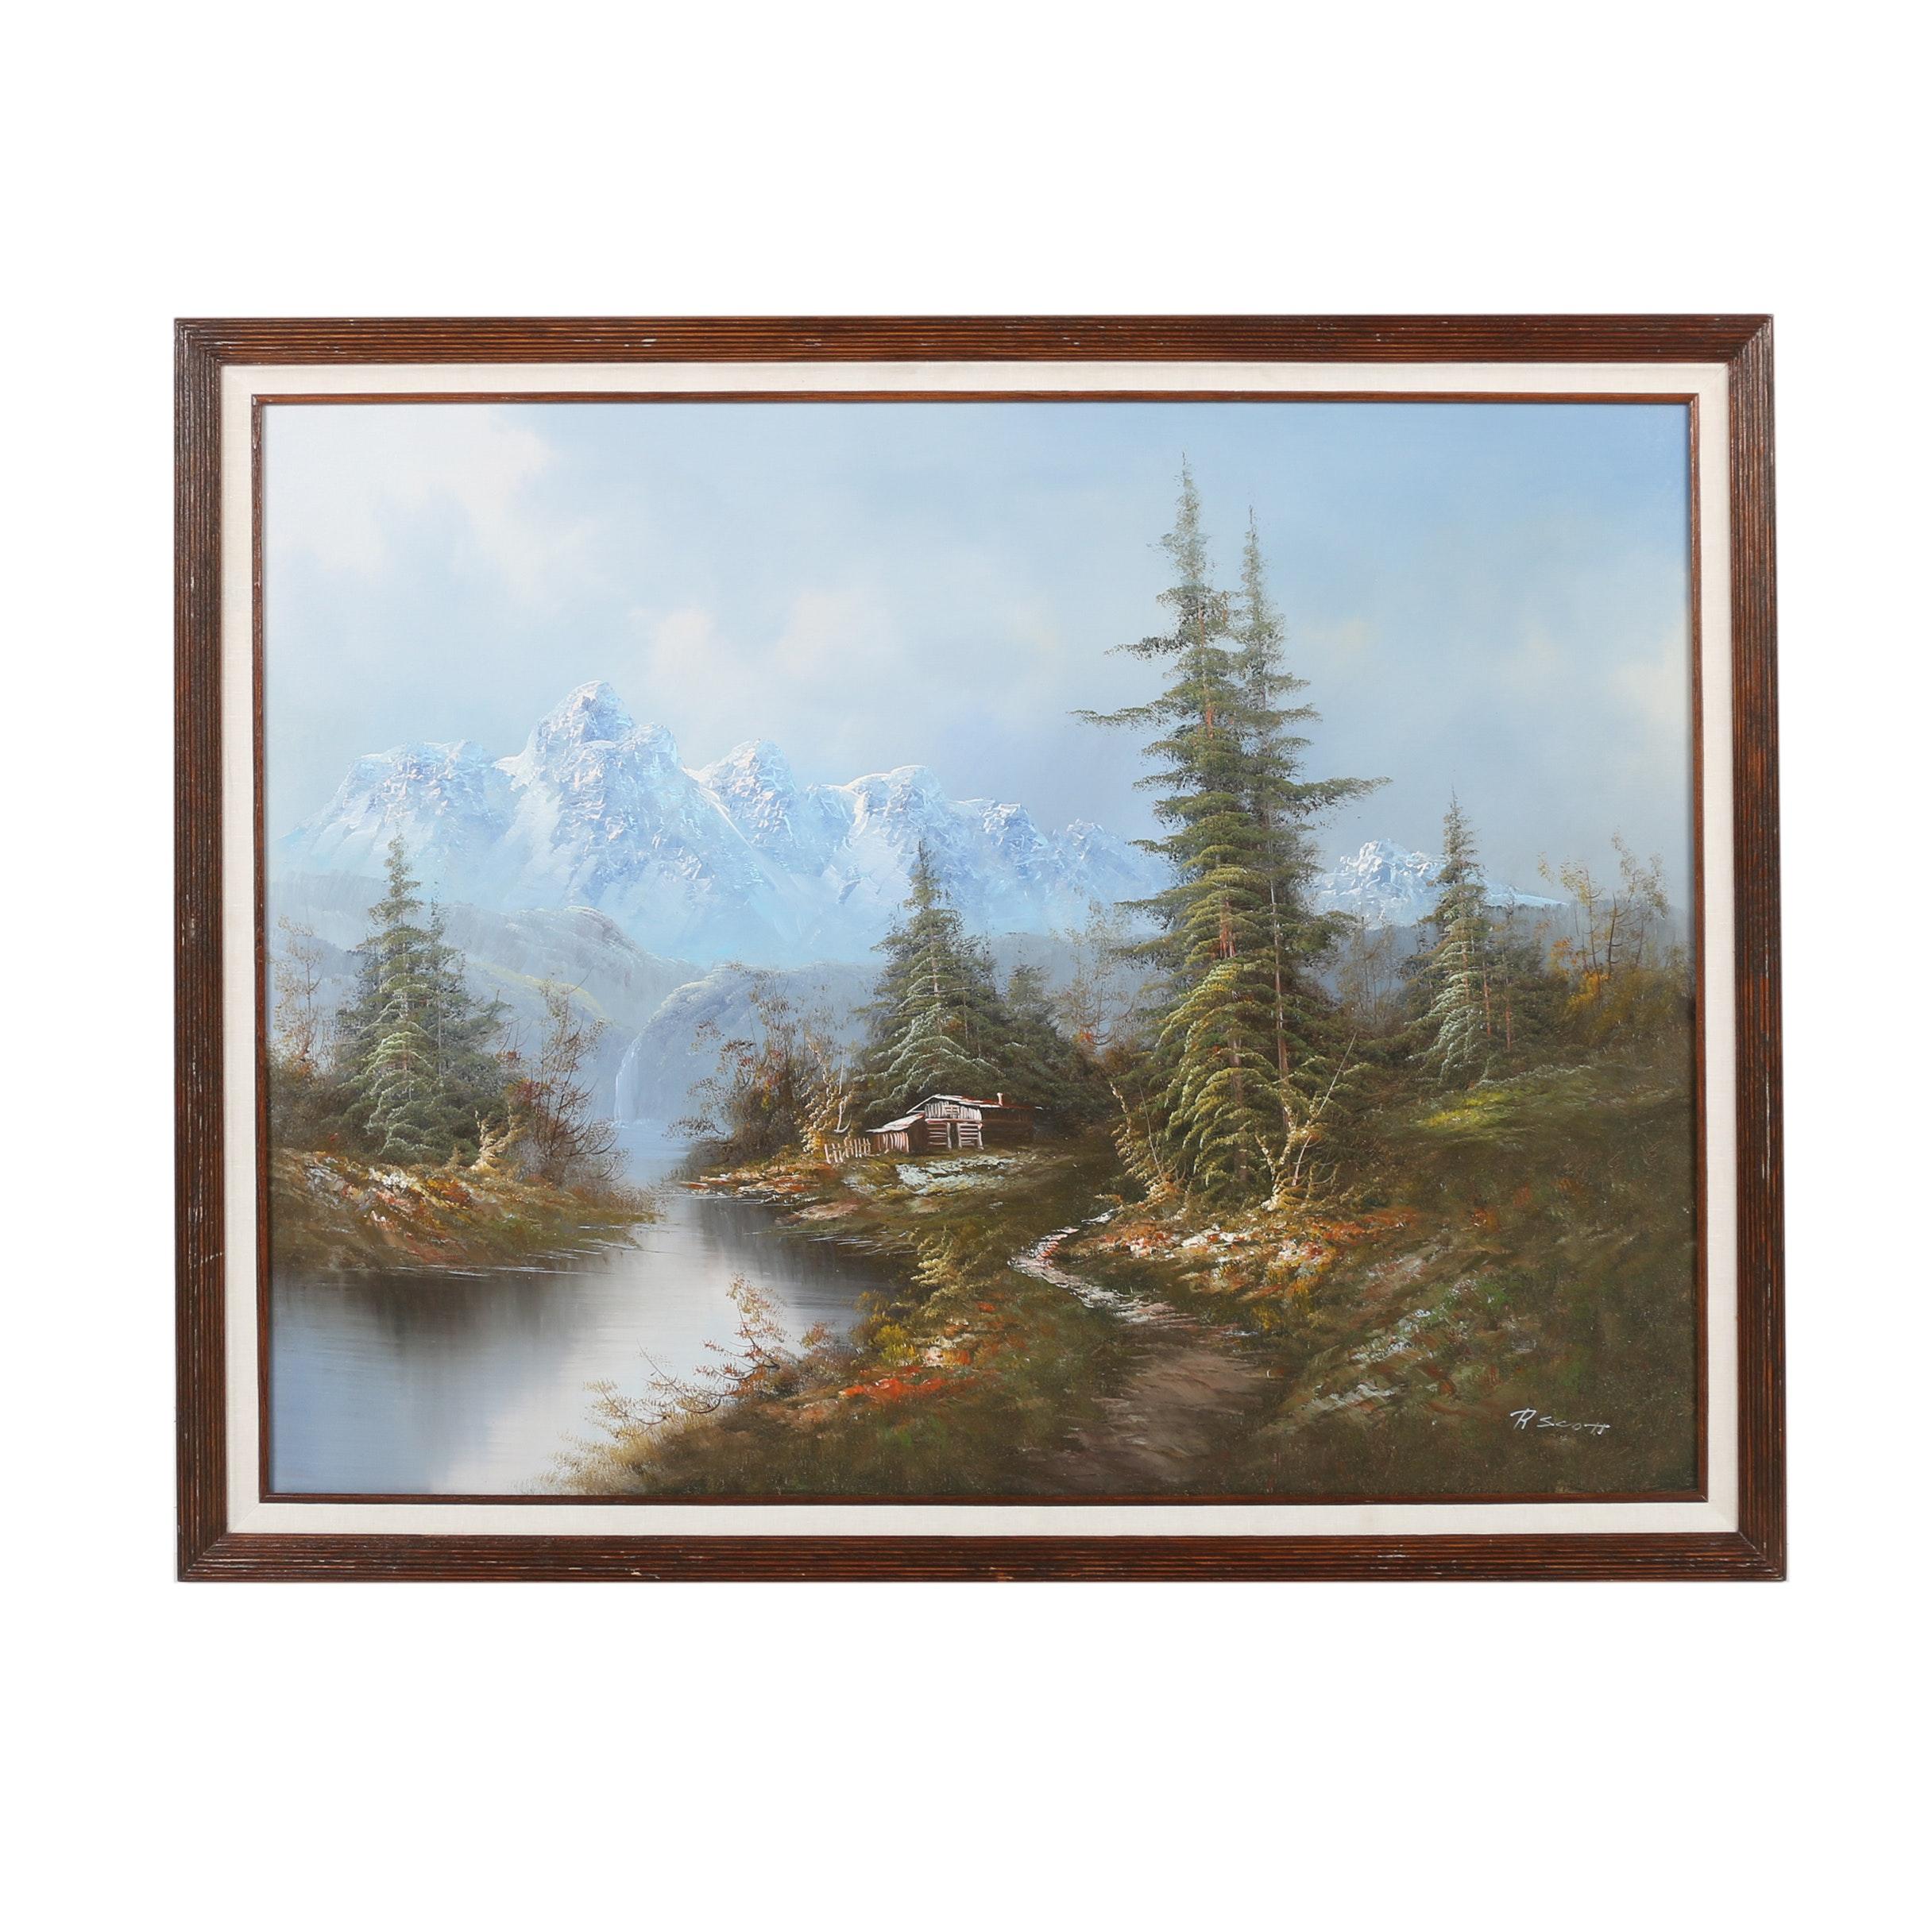 R. Scott Oil Painting of Idyllic Mountainscape